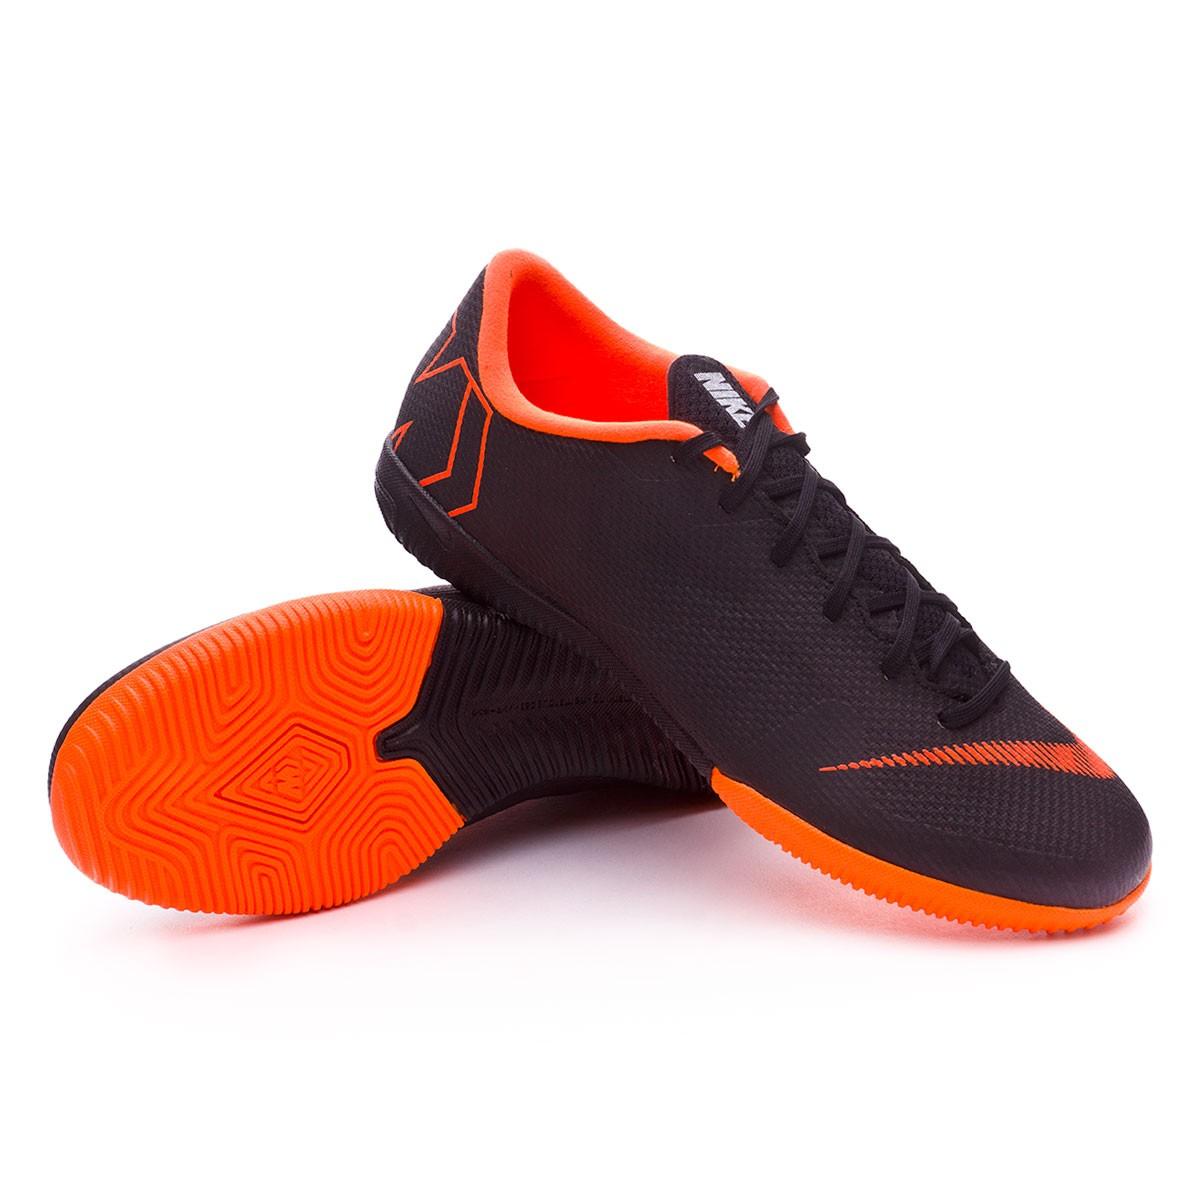 c992a465e5c ... Zapatilla Mercurial VaporX XII Academy IC Black-Total orange-White.  CATEGORY. Futsal · Futsal boots · Nike